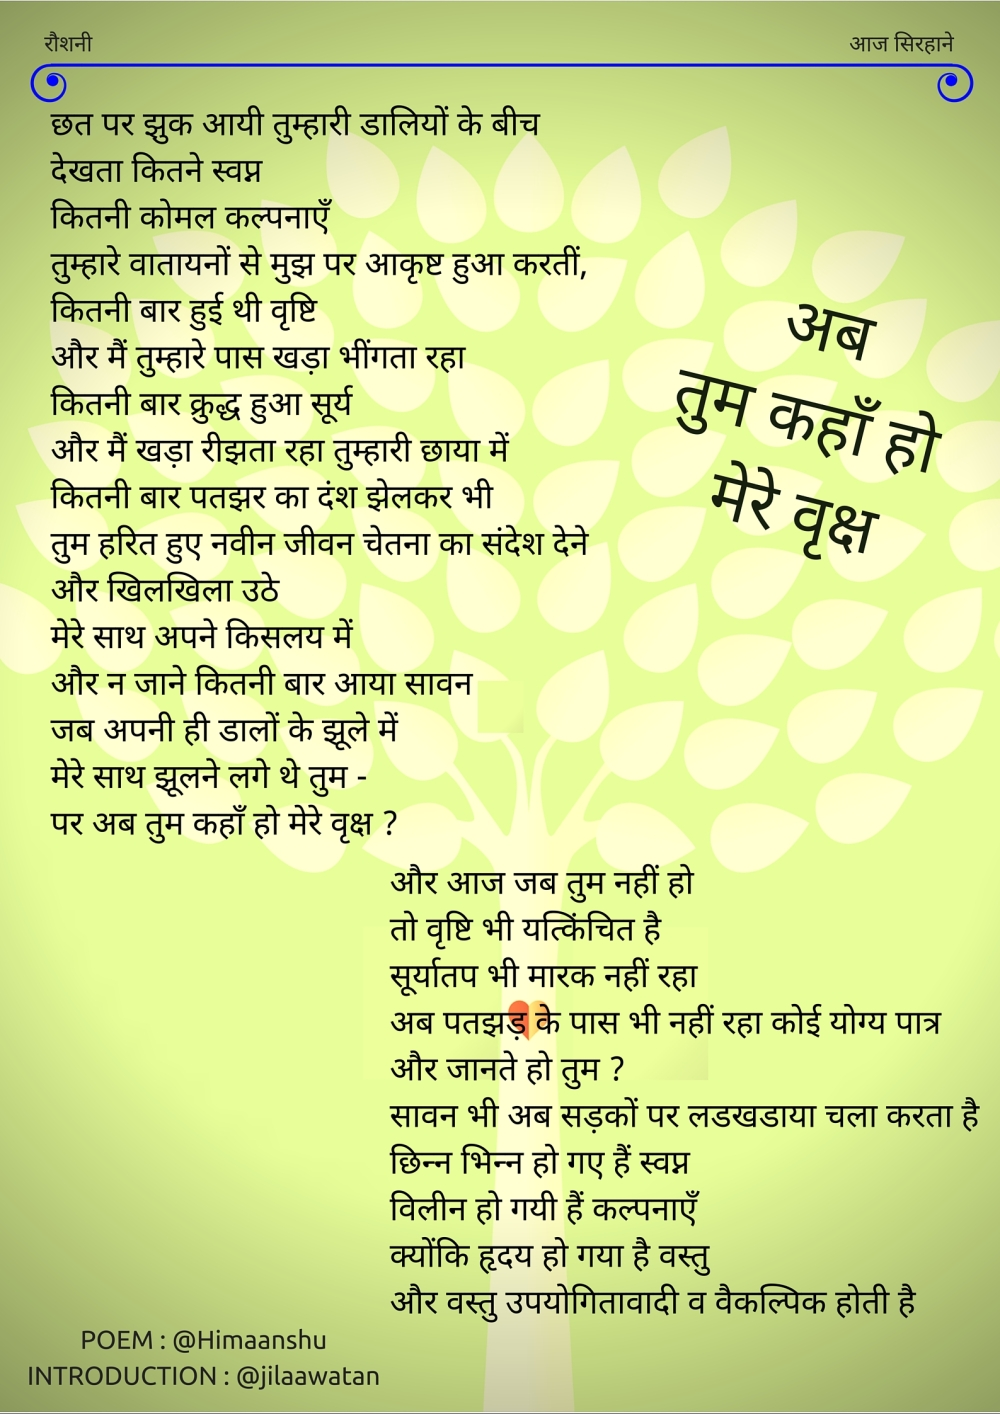 himanshu roshni may 2